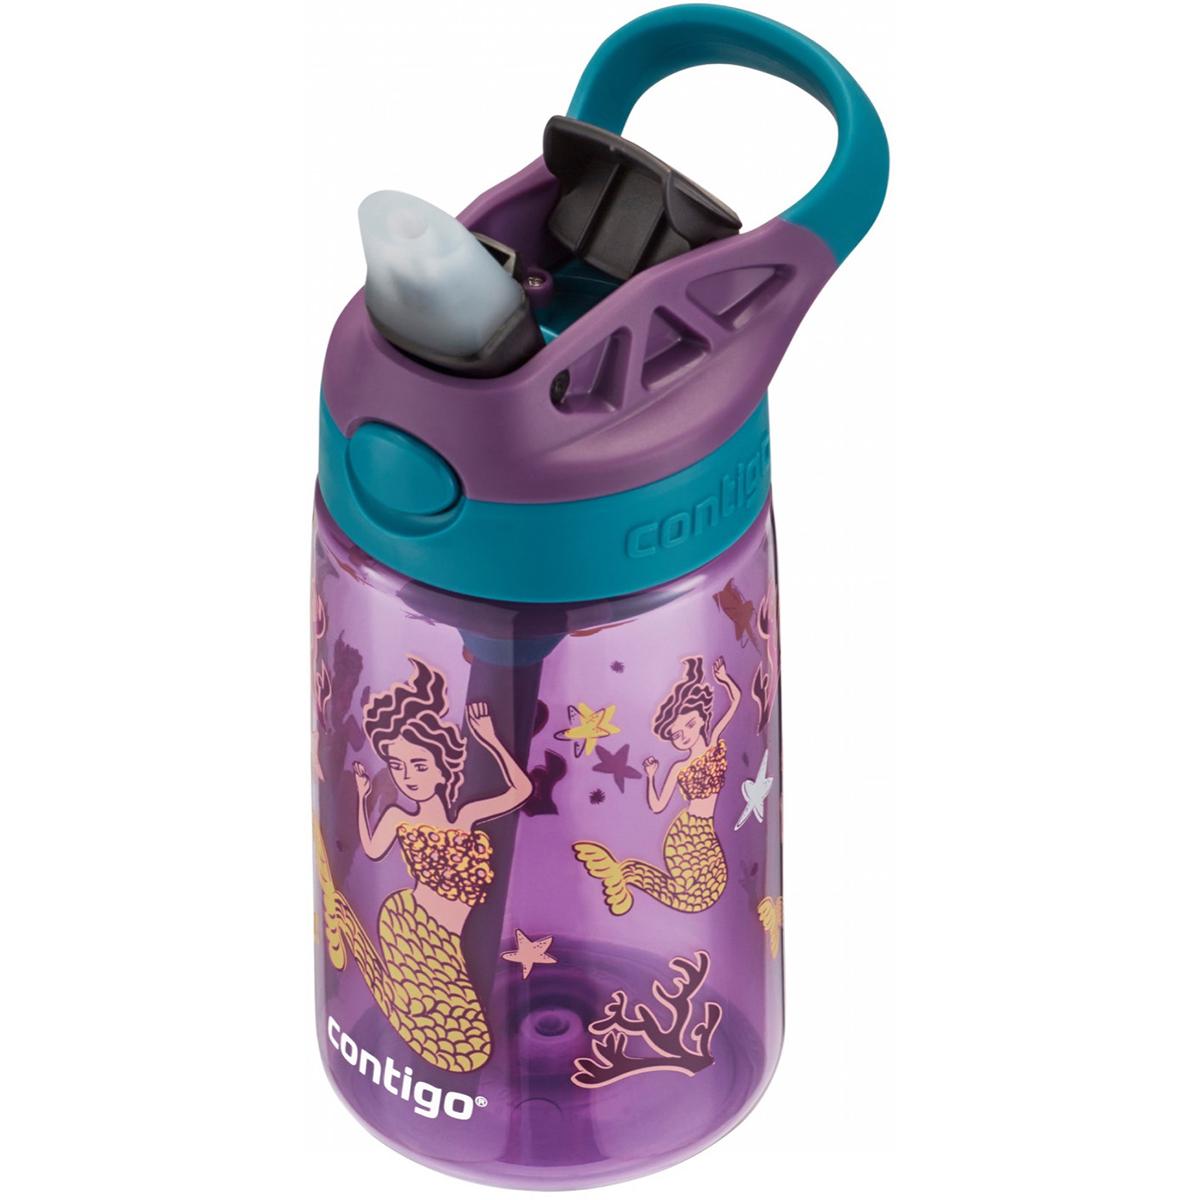 Contigo-Kid-039-s-14-oz-AutoSpout-Straw-Water-Bottle-with-Easy-Clean-Lid thumbnail 28